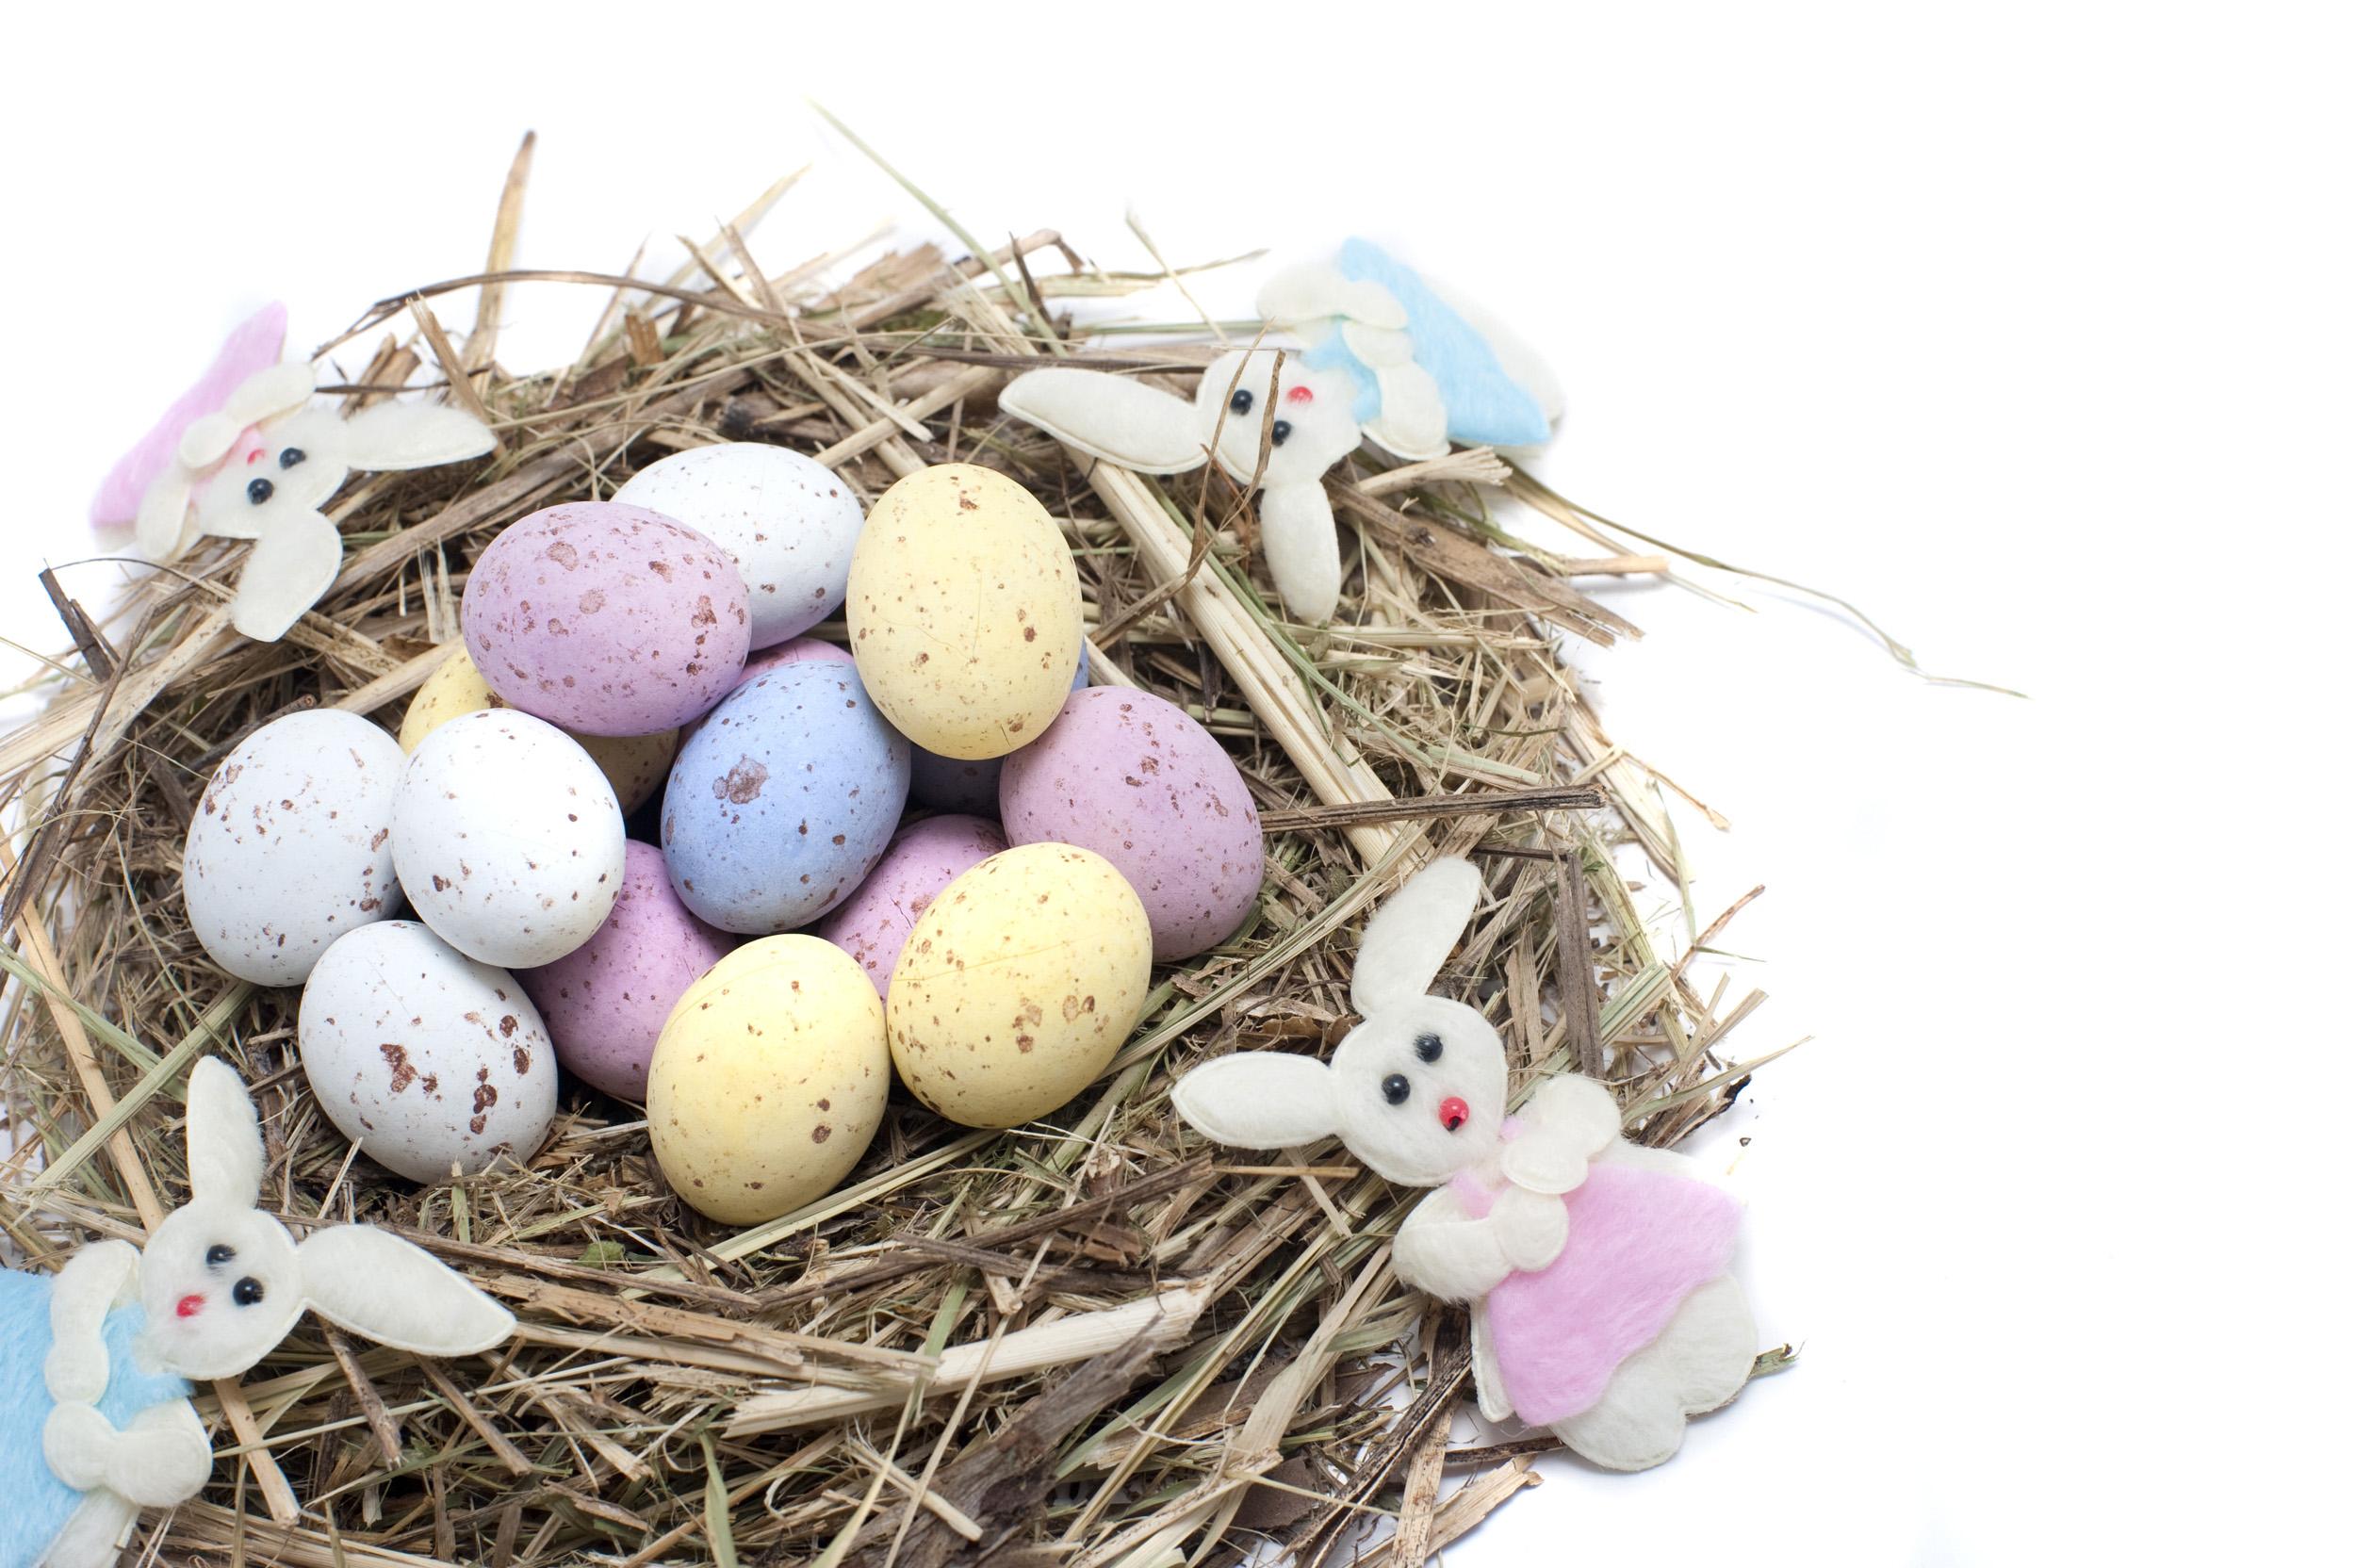 Bunny's Nest for easter